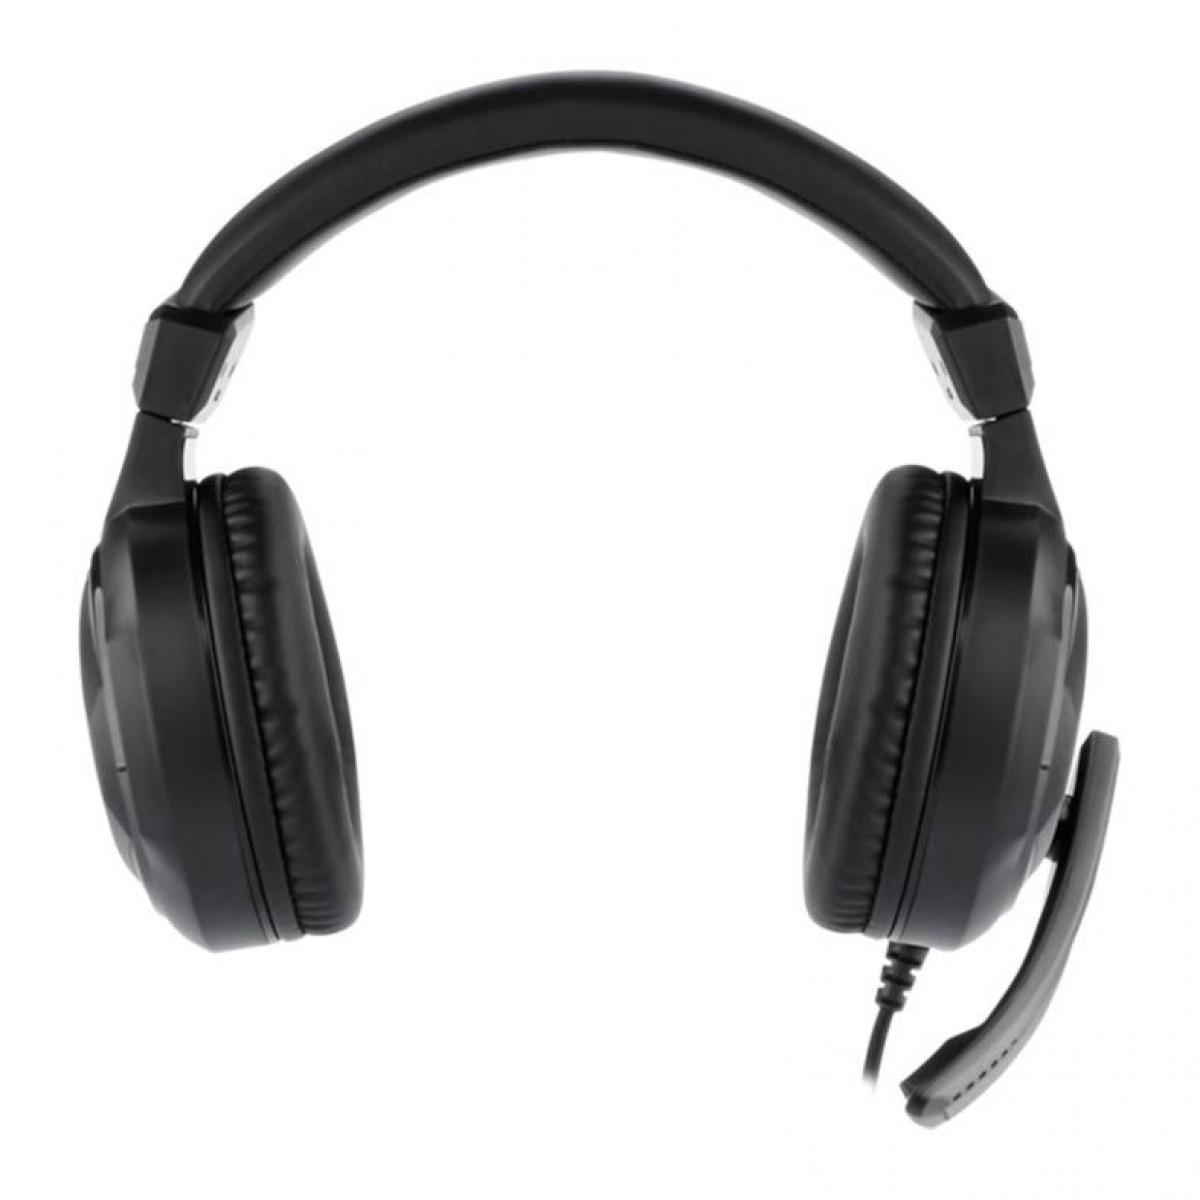 Headset Gamer T-Dagger Mckinley, 40mm, Black, T-RGH101